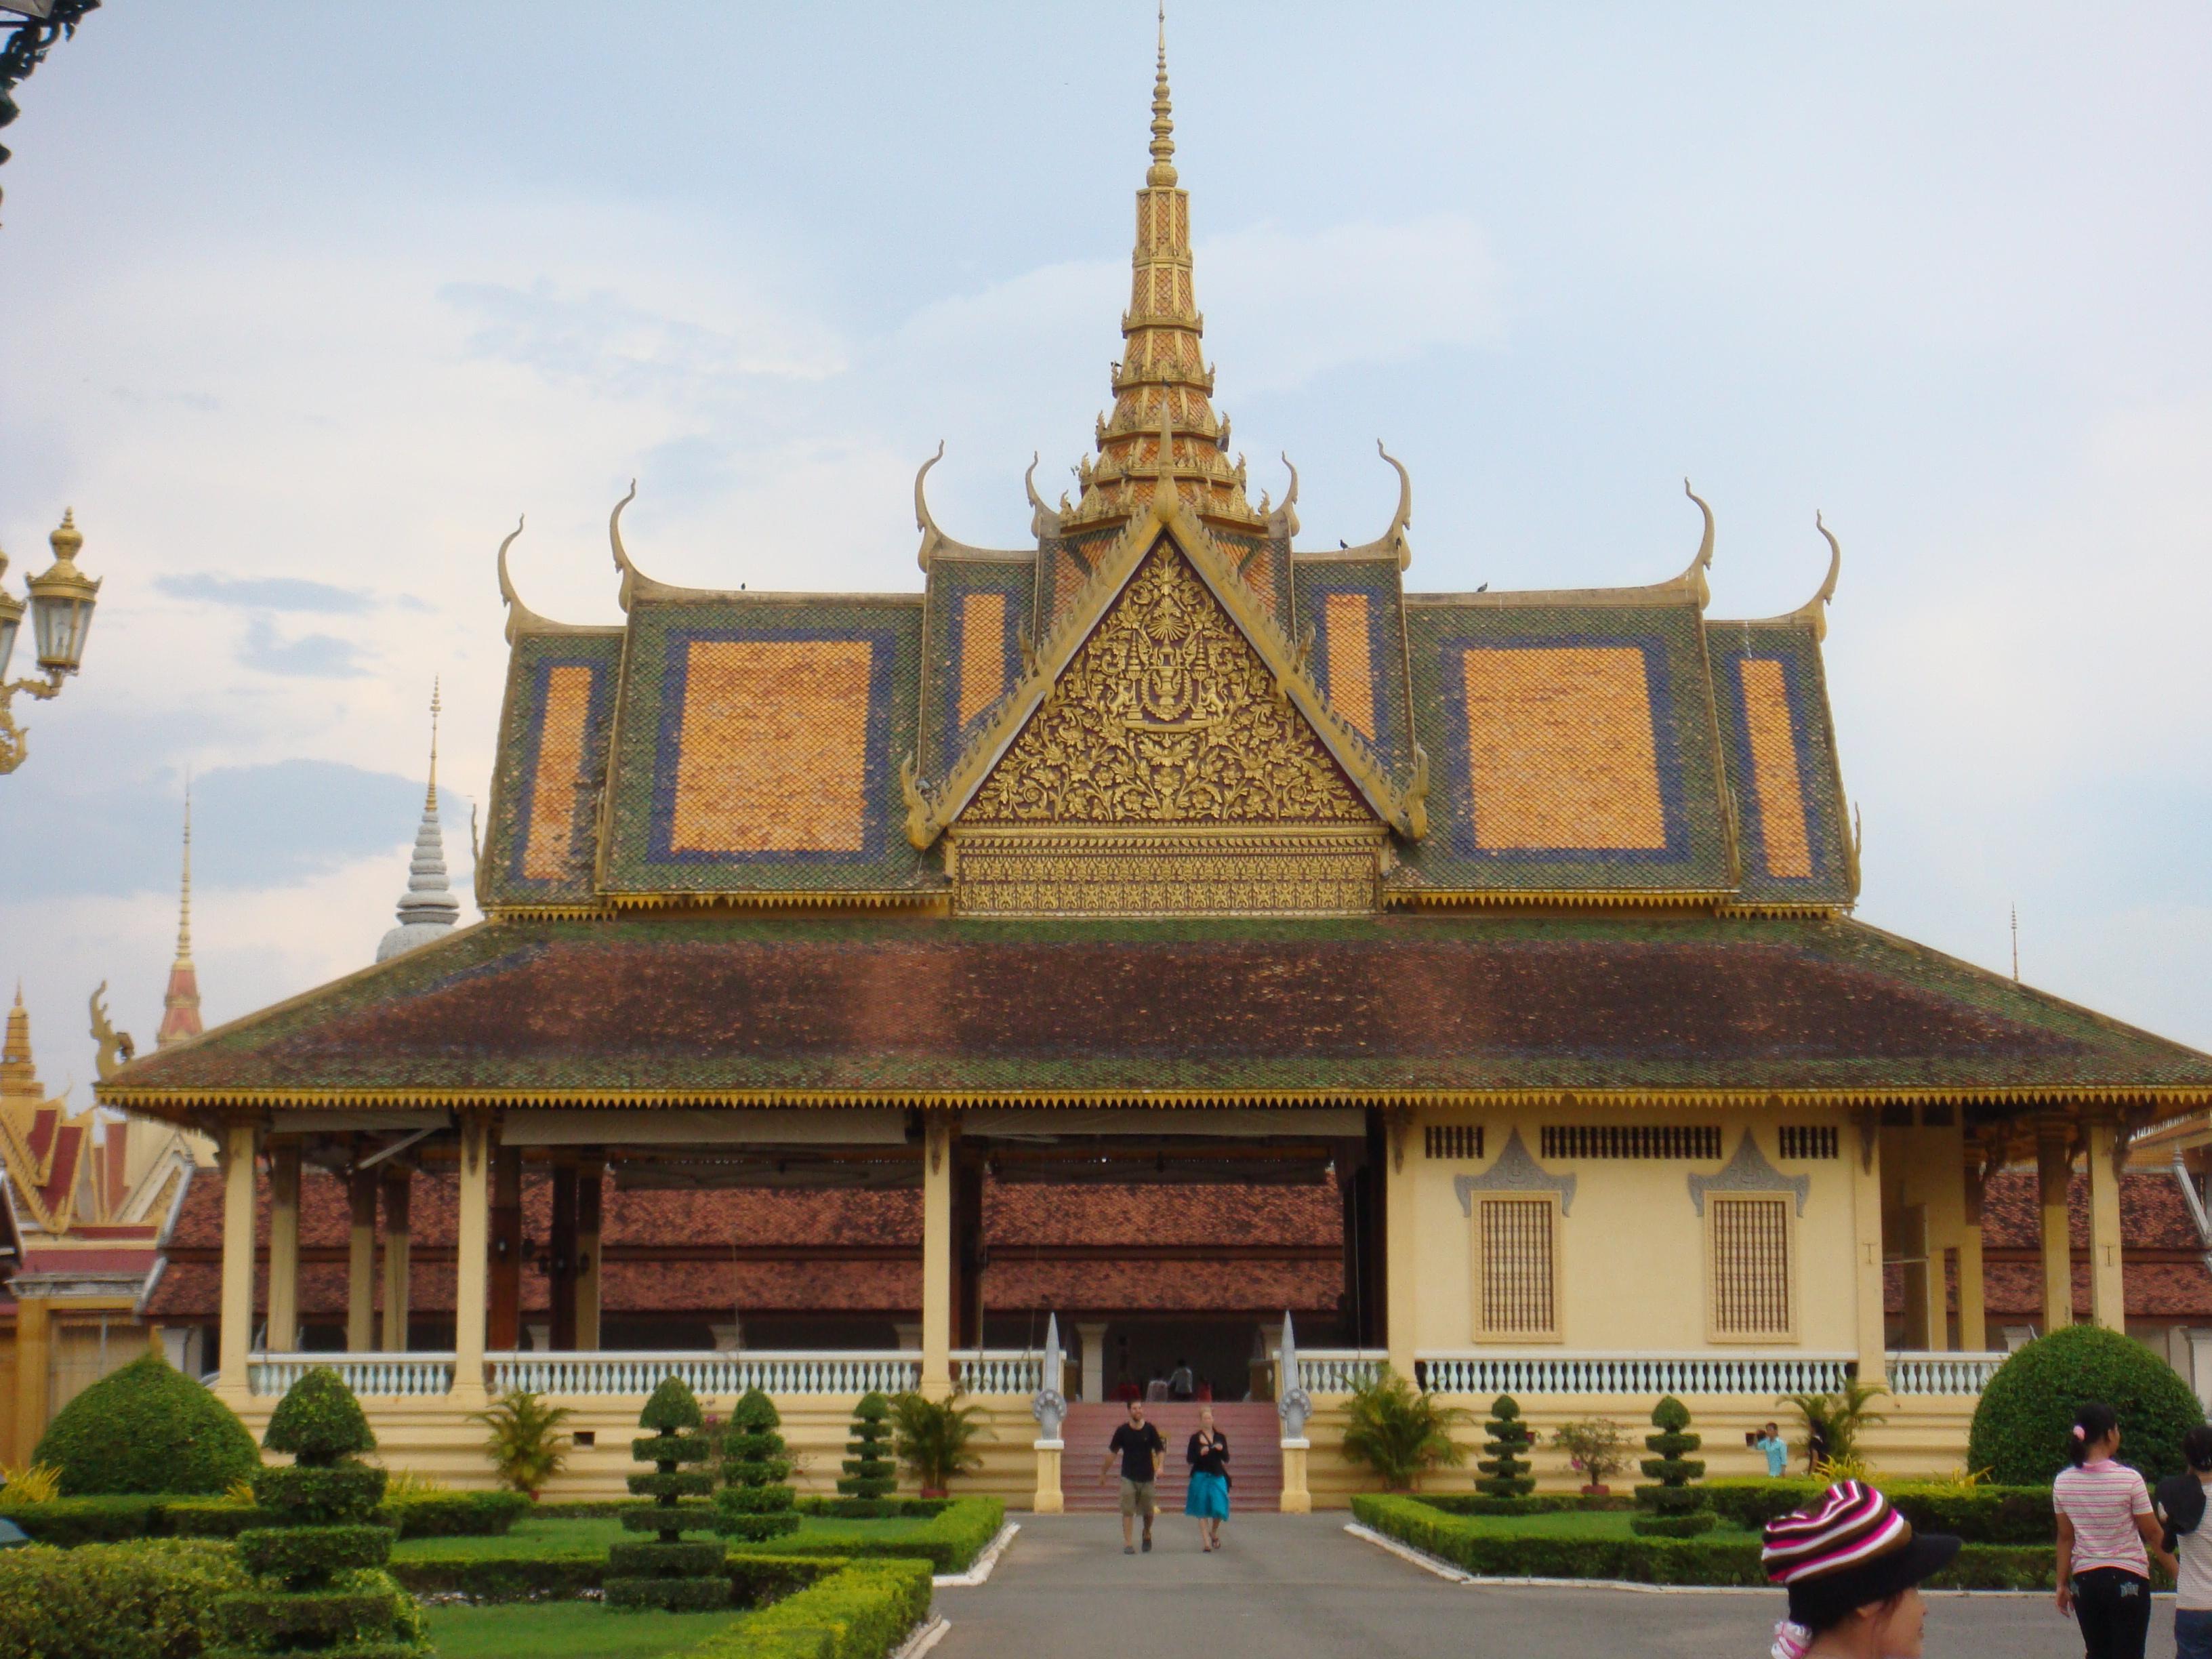 Royal Palace, Phnom Penh Backgrounds on Wallpapers Vista